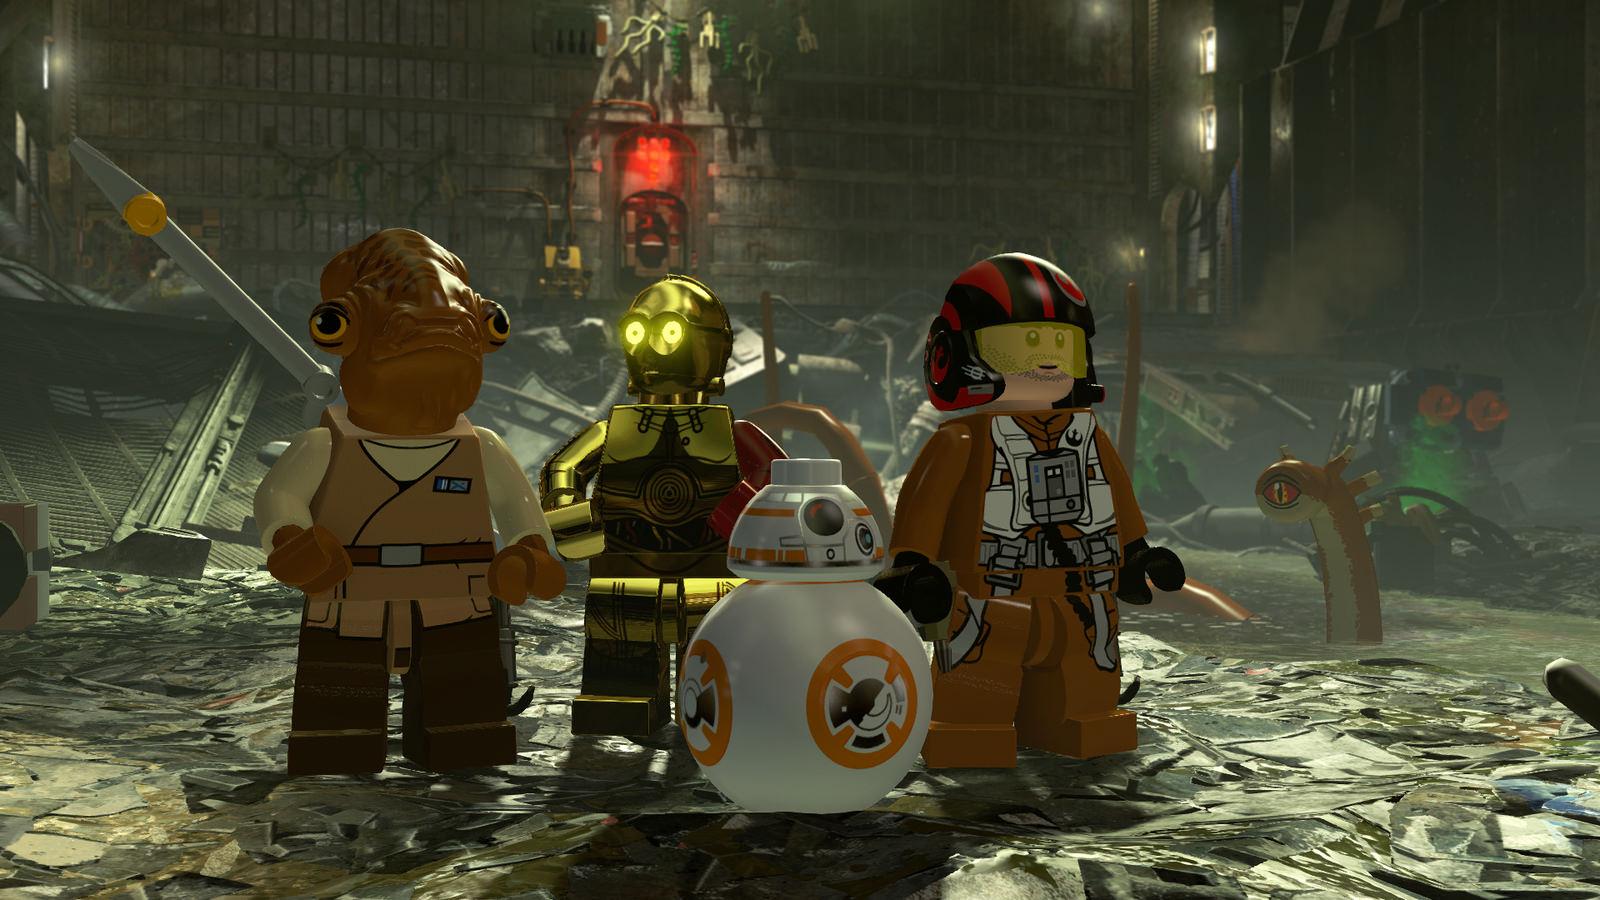 lego star wars the force awakens stars harrison ford carrie fisher more vg247. Black Bedroom Furniture Sets. Home Design Ideas